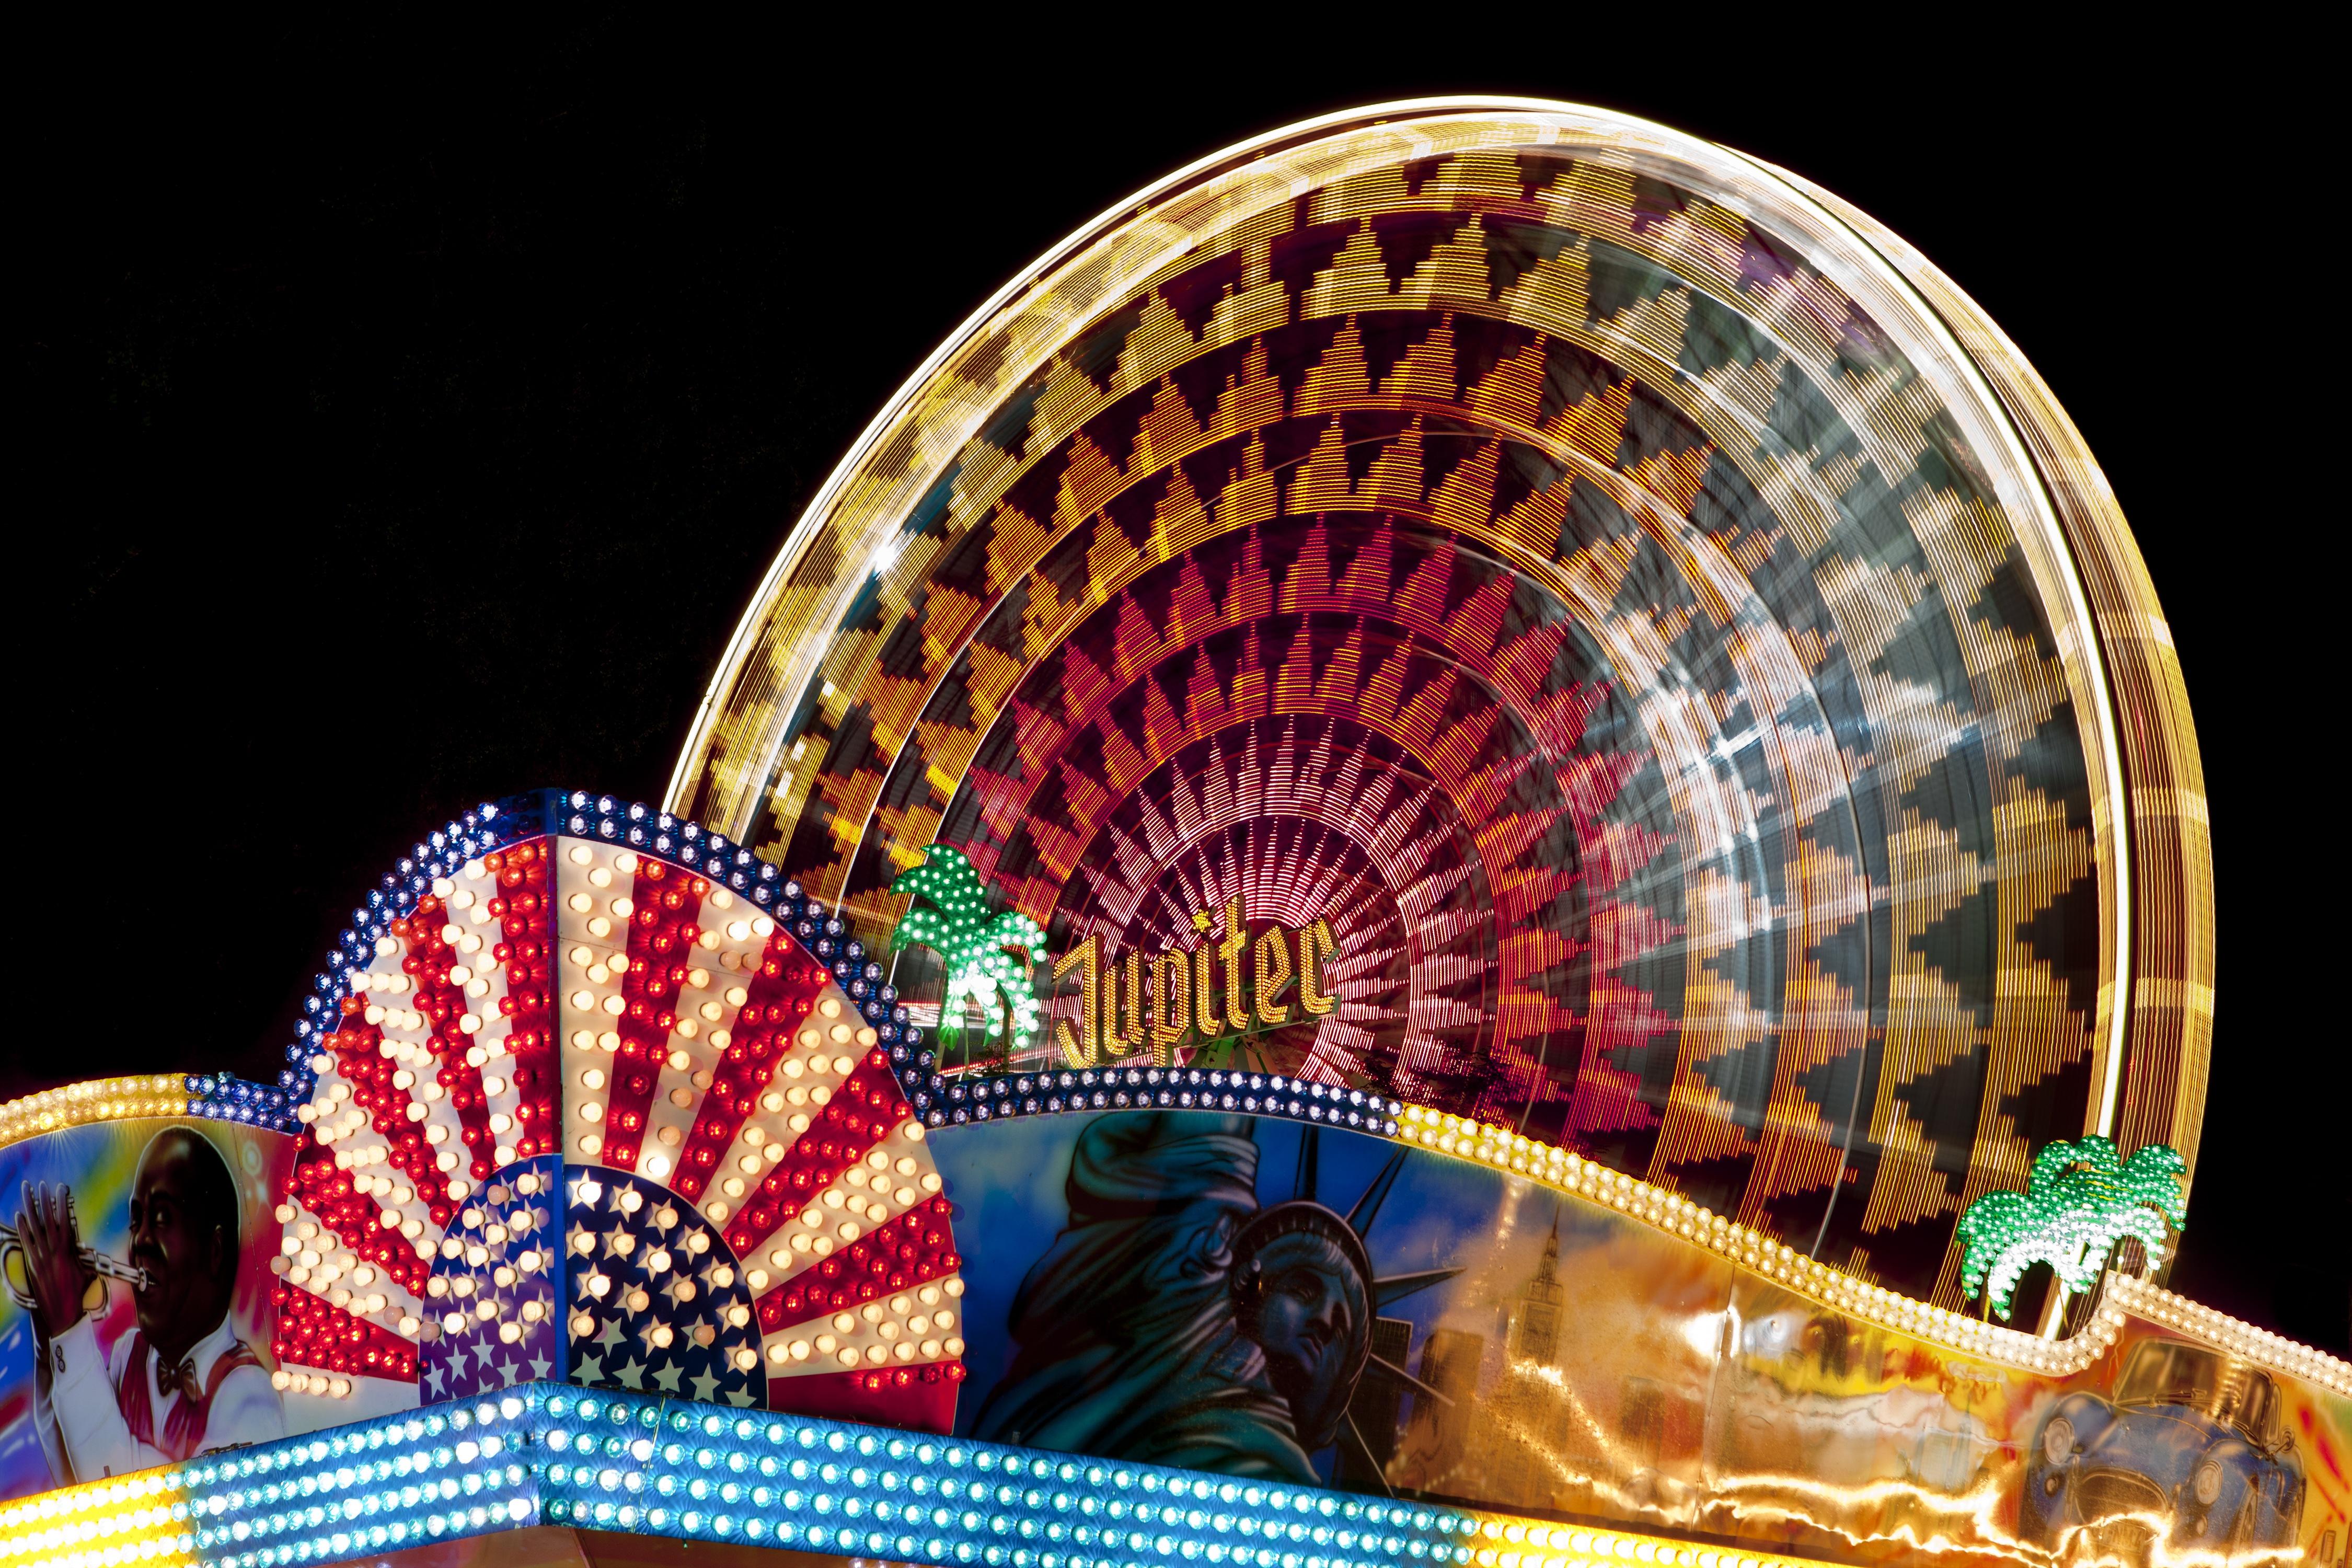 Free Images Night Ferris Wheel Carnival Amusement